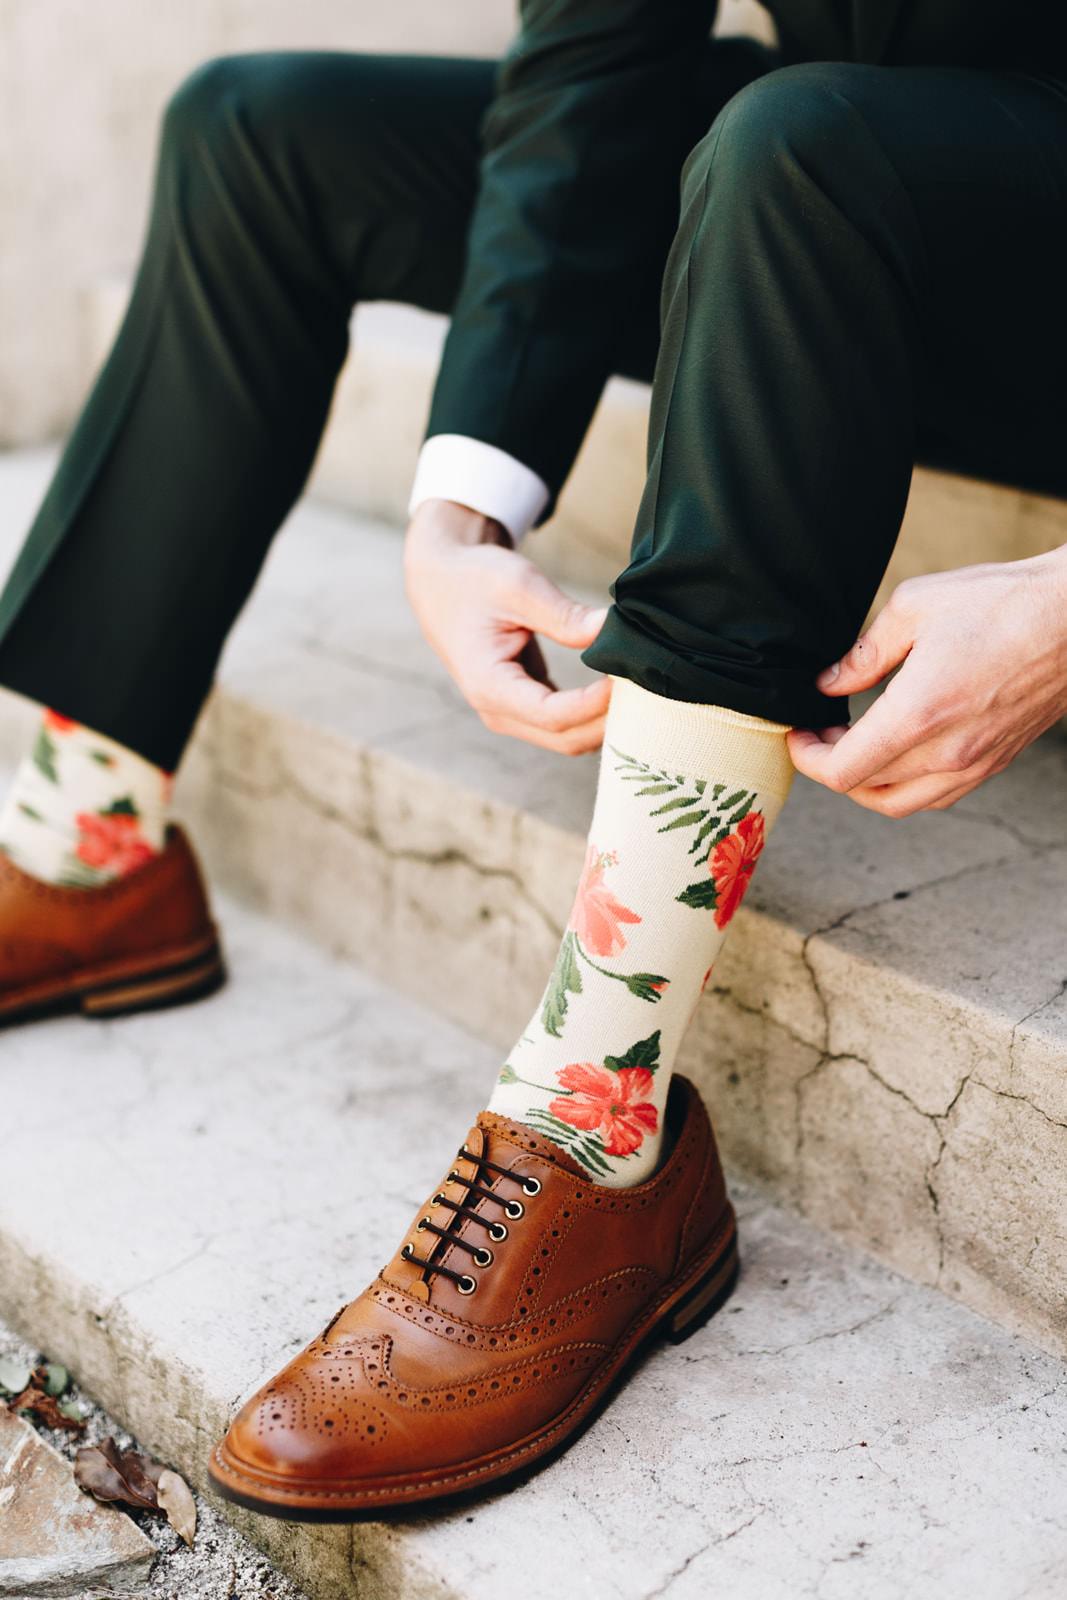 Groom getting ready, putting on tropical flower socks.